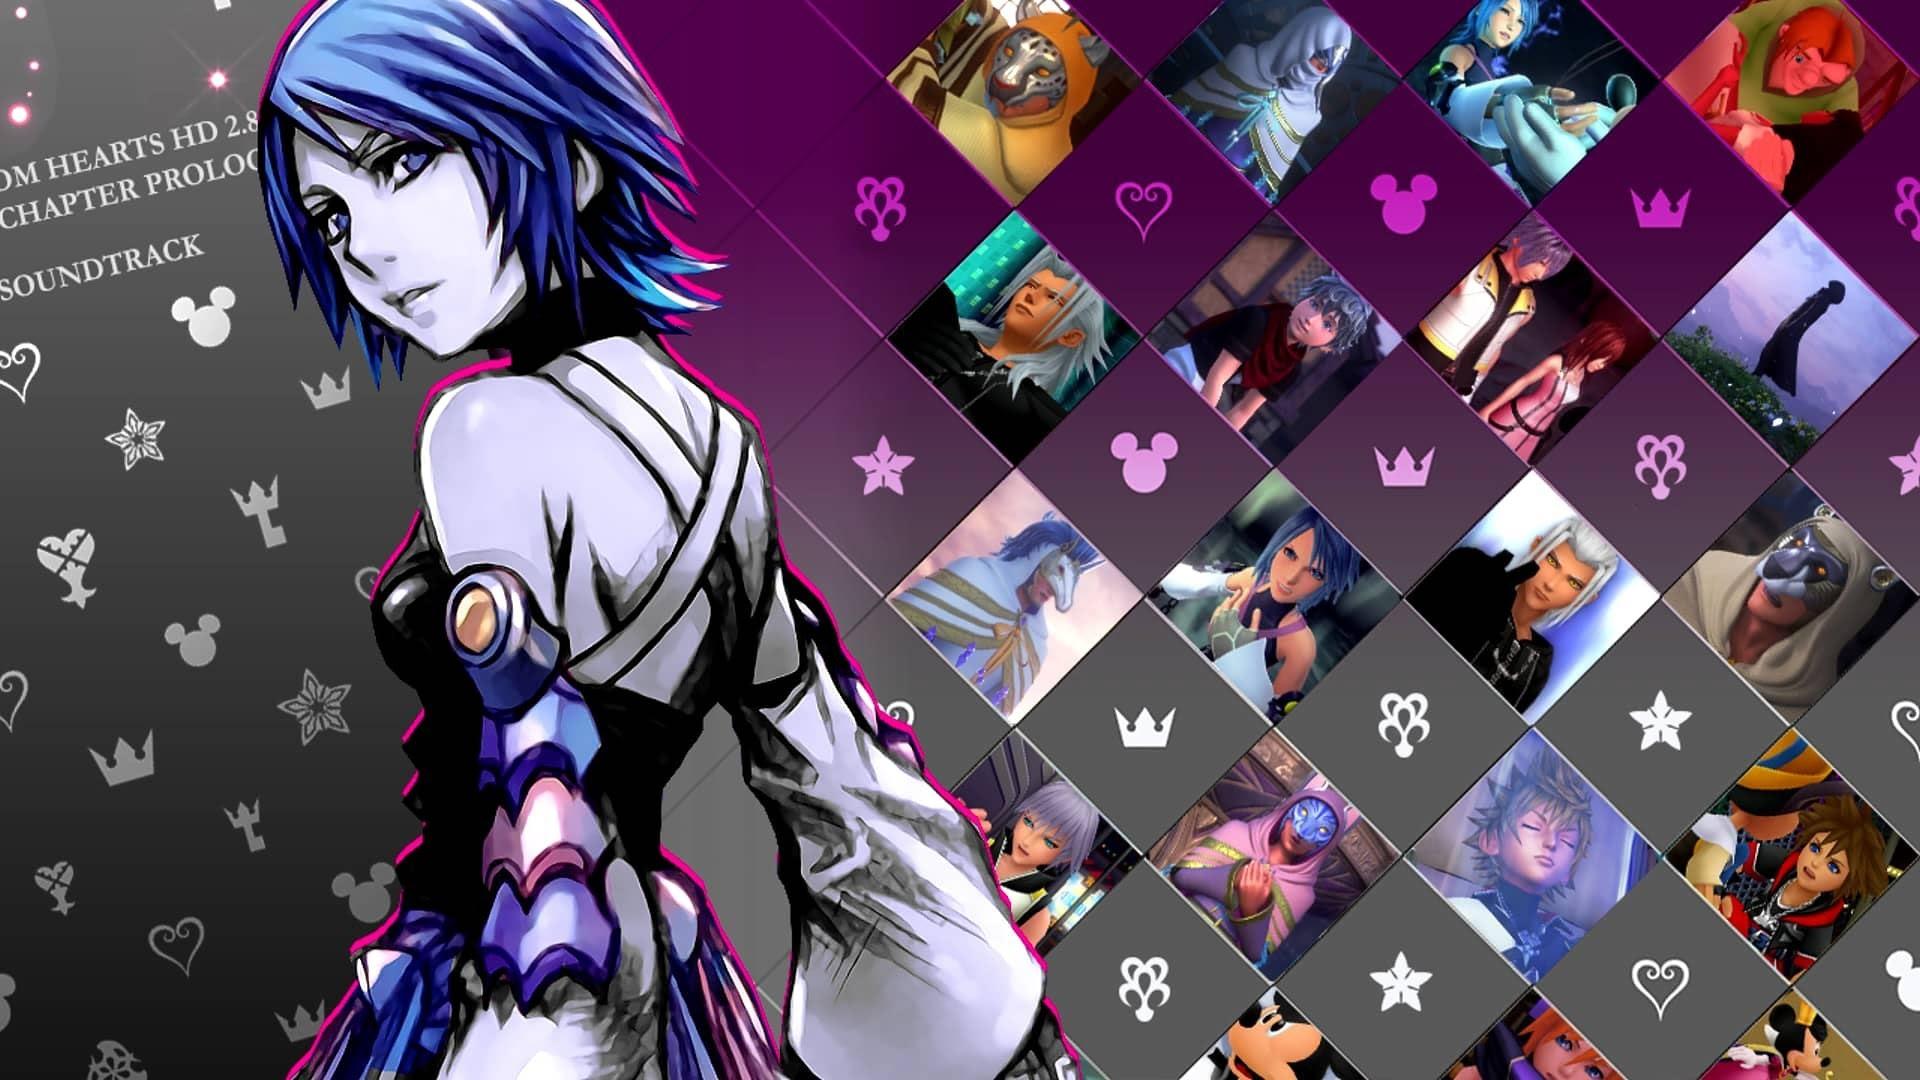 Kingdom Hearts Wallpaper 1920x1080 Hd Wallpaper For Desktop